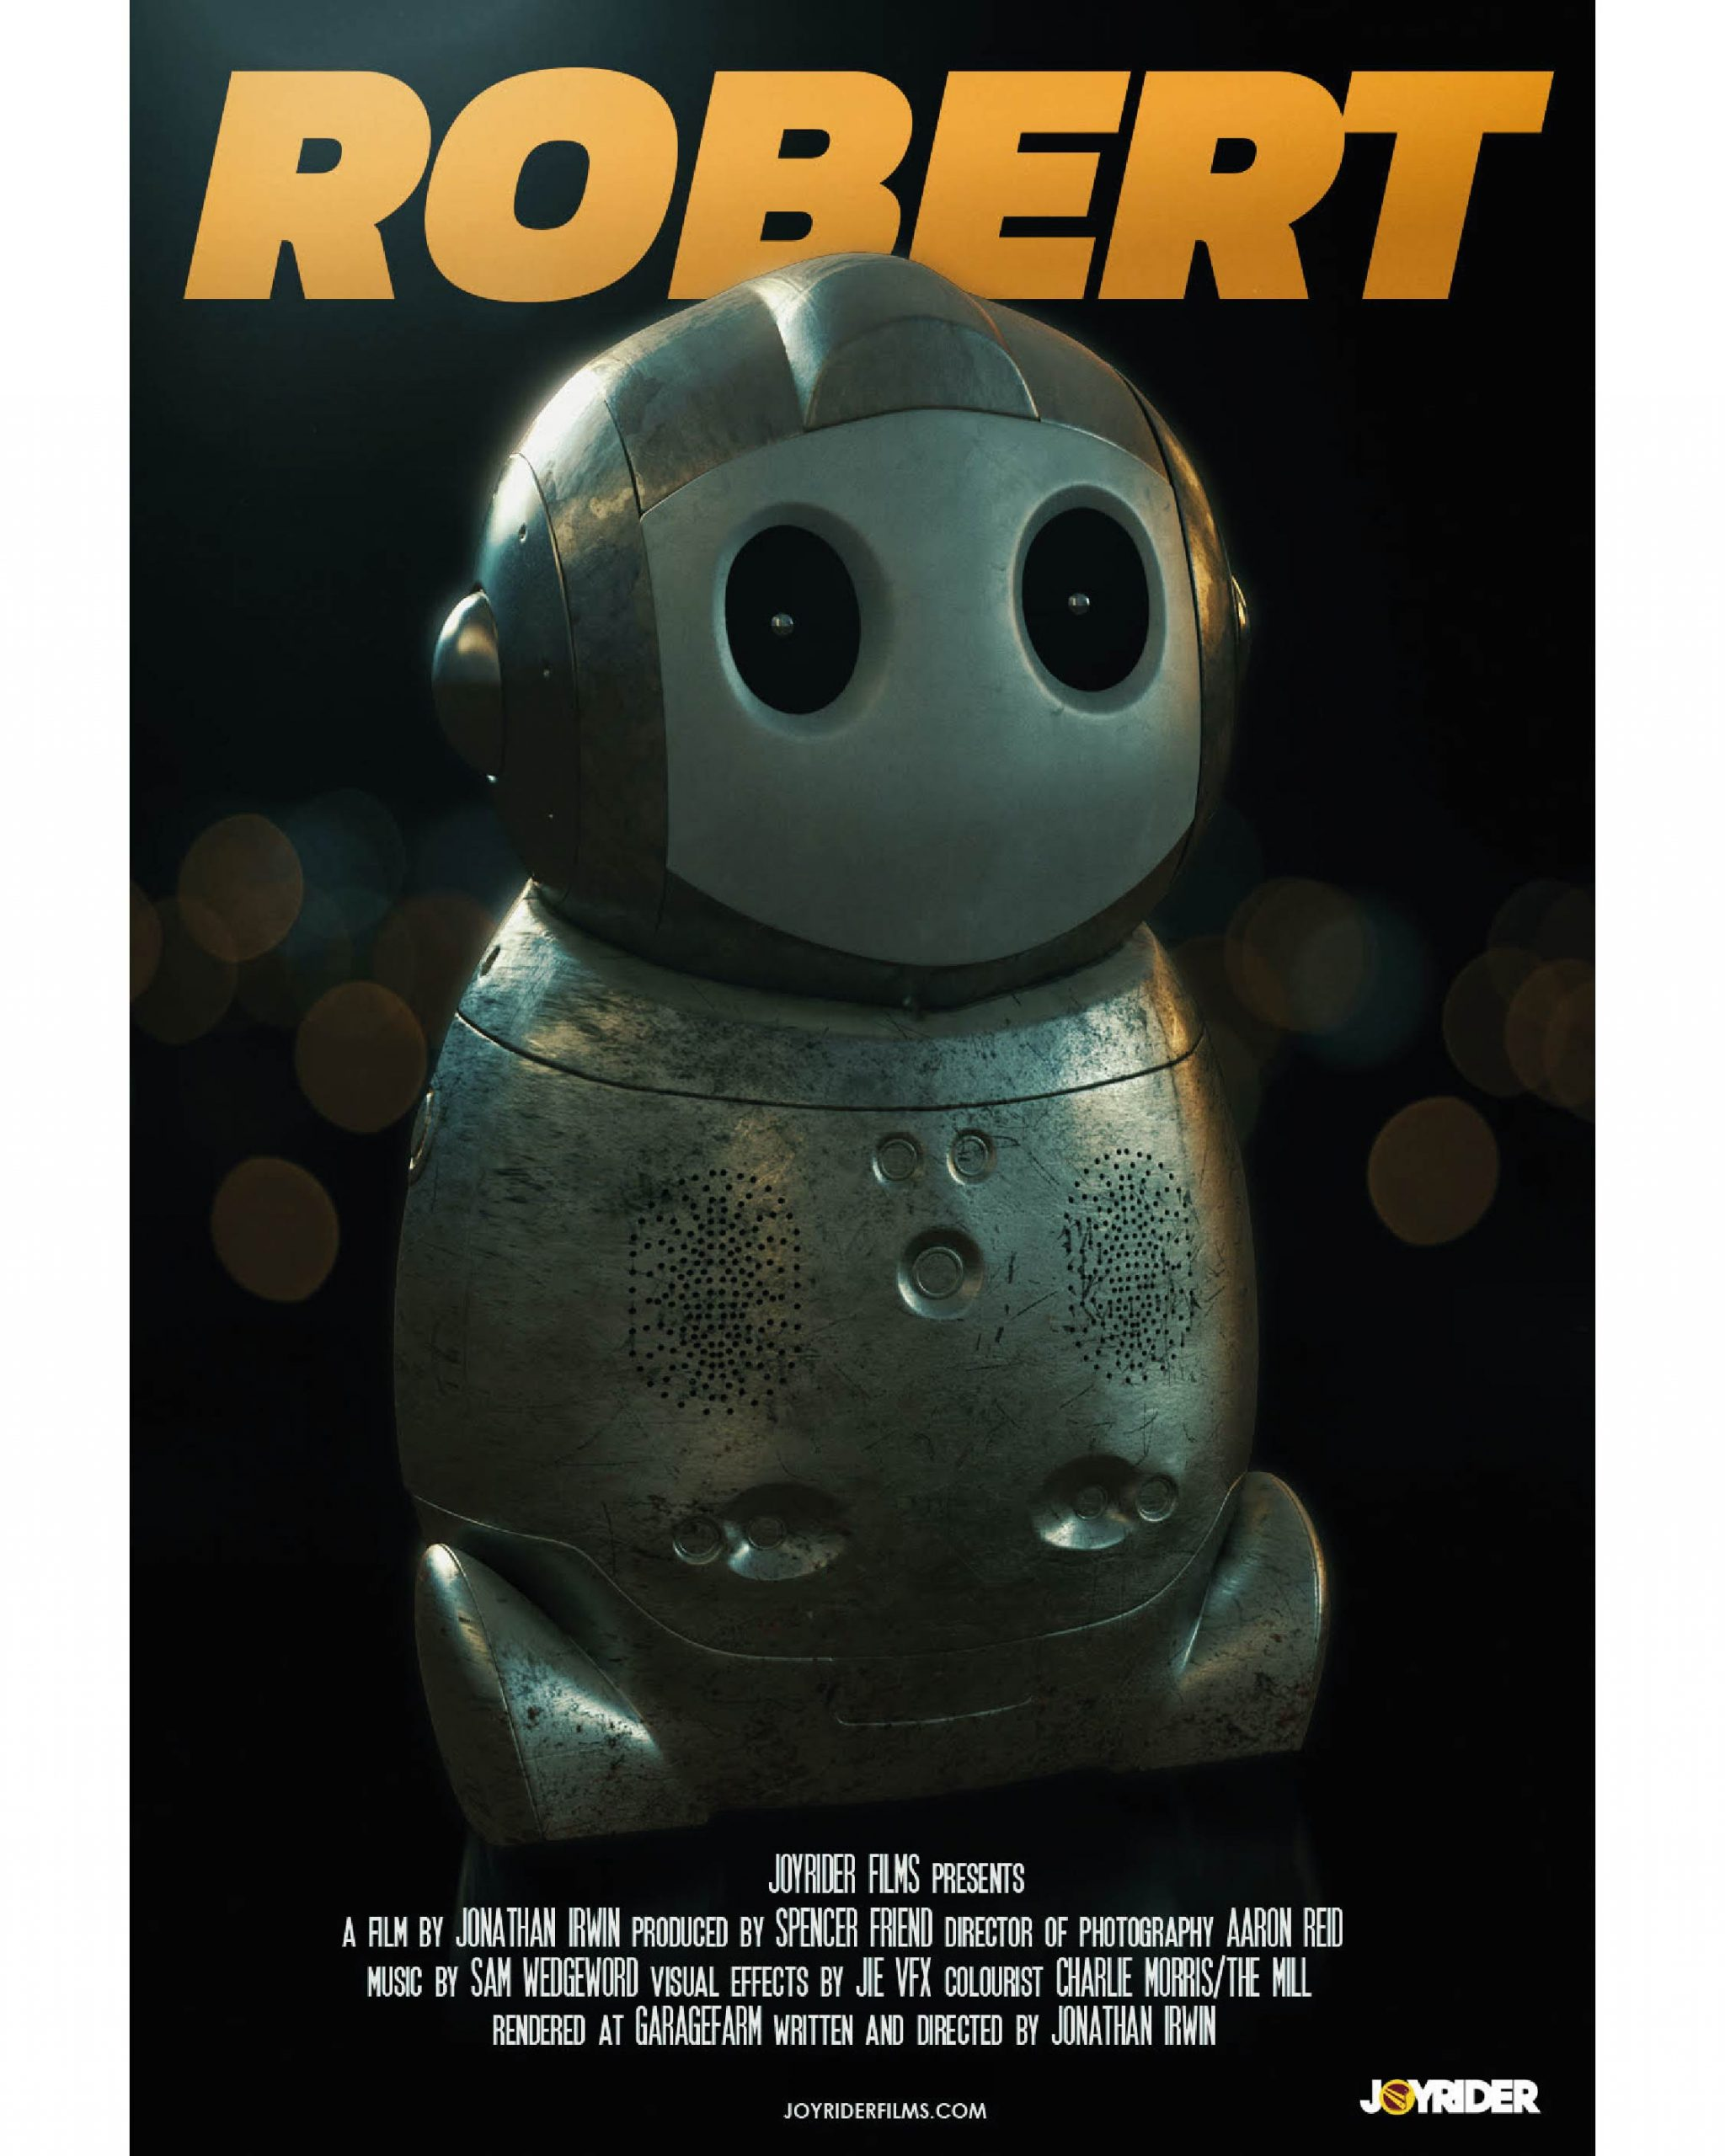 hexagon film festival robert the robot